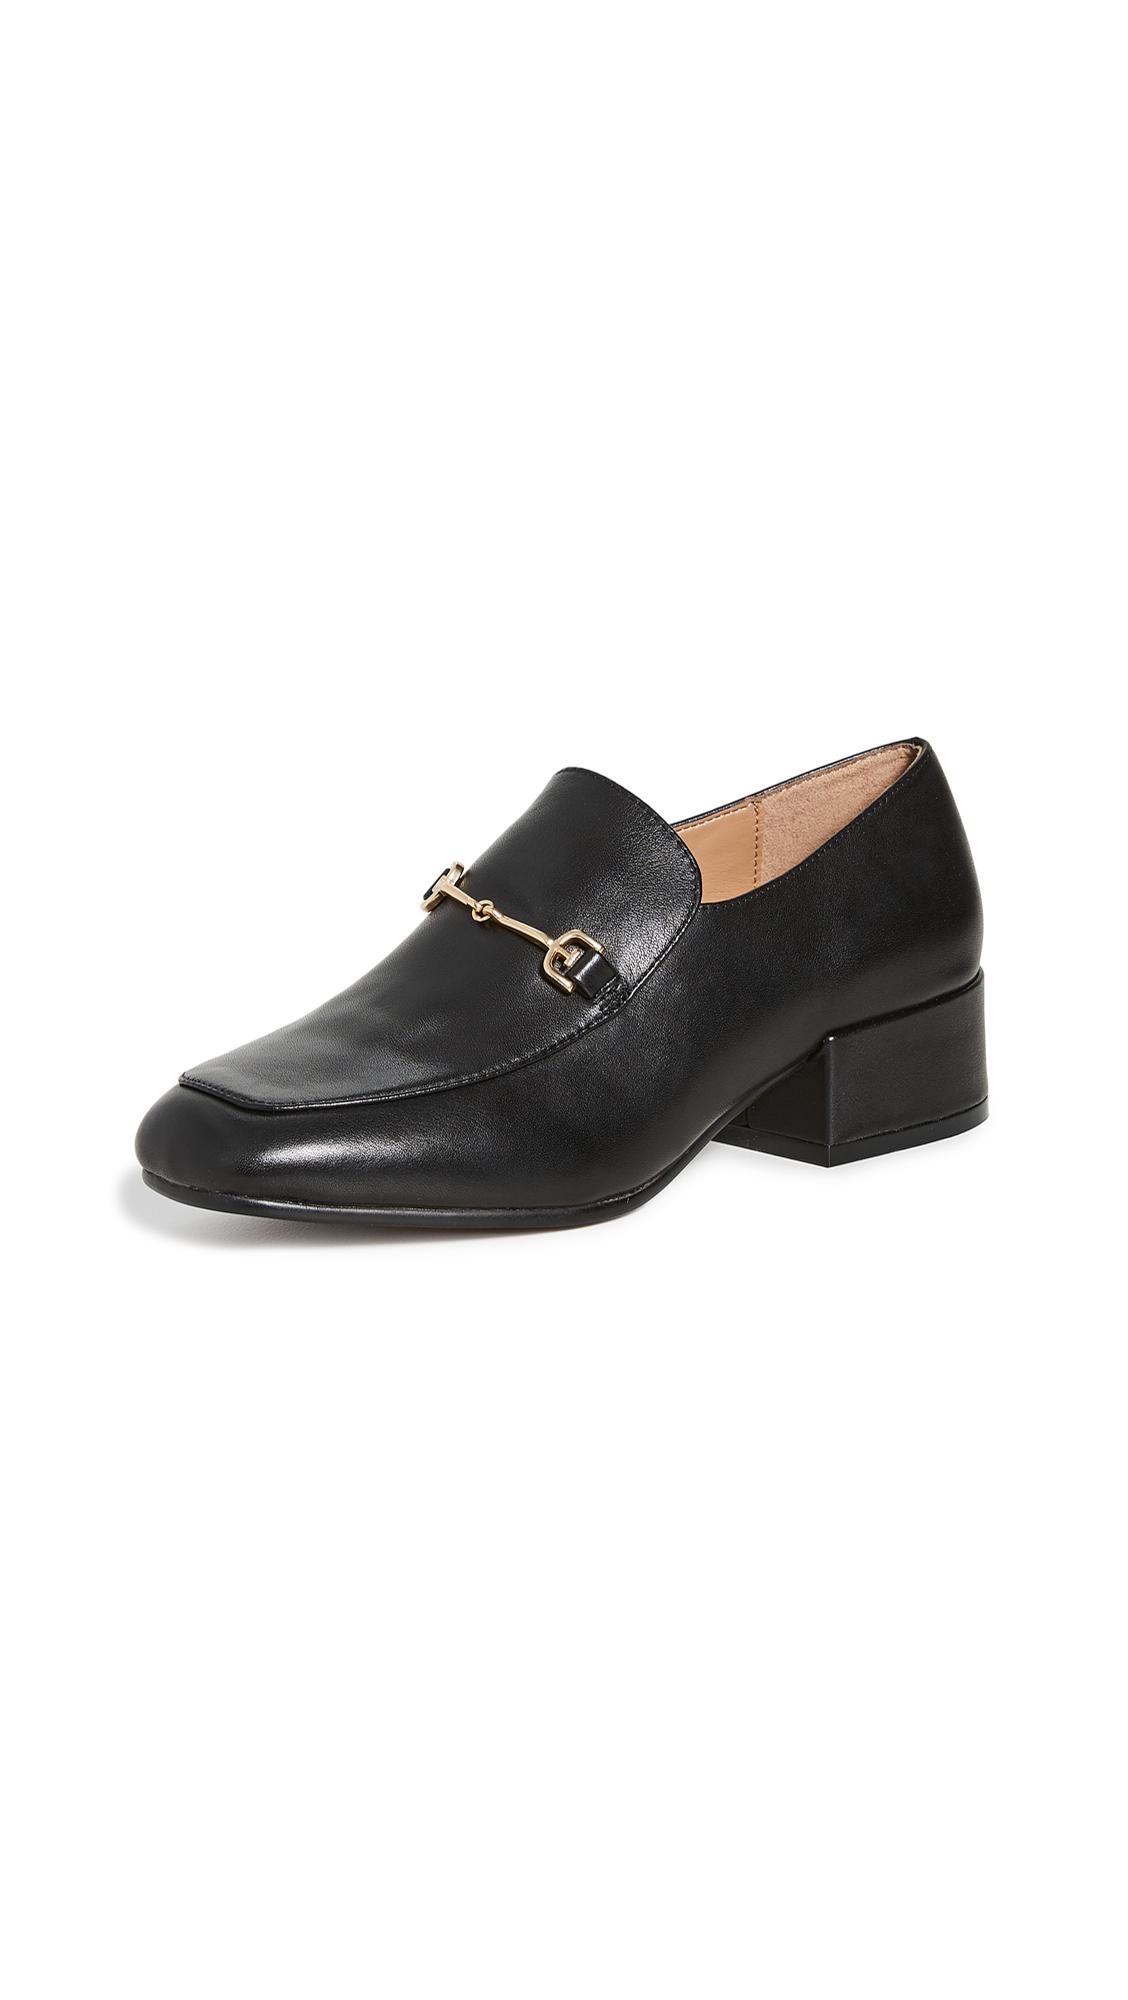 Buy Sam Edelman Jamille Loafers online, shop Sam Edelman